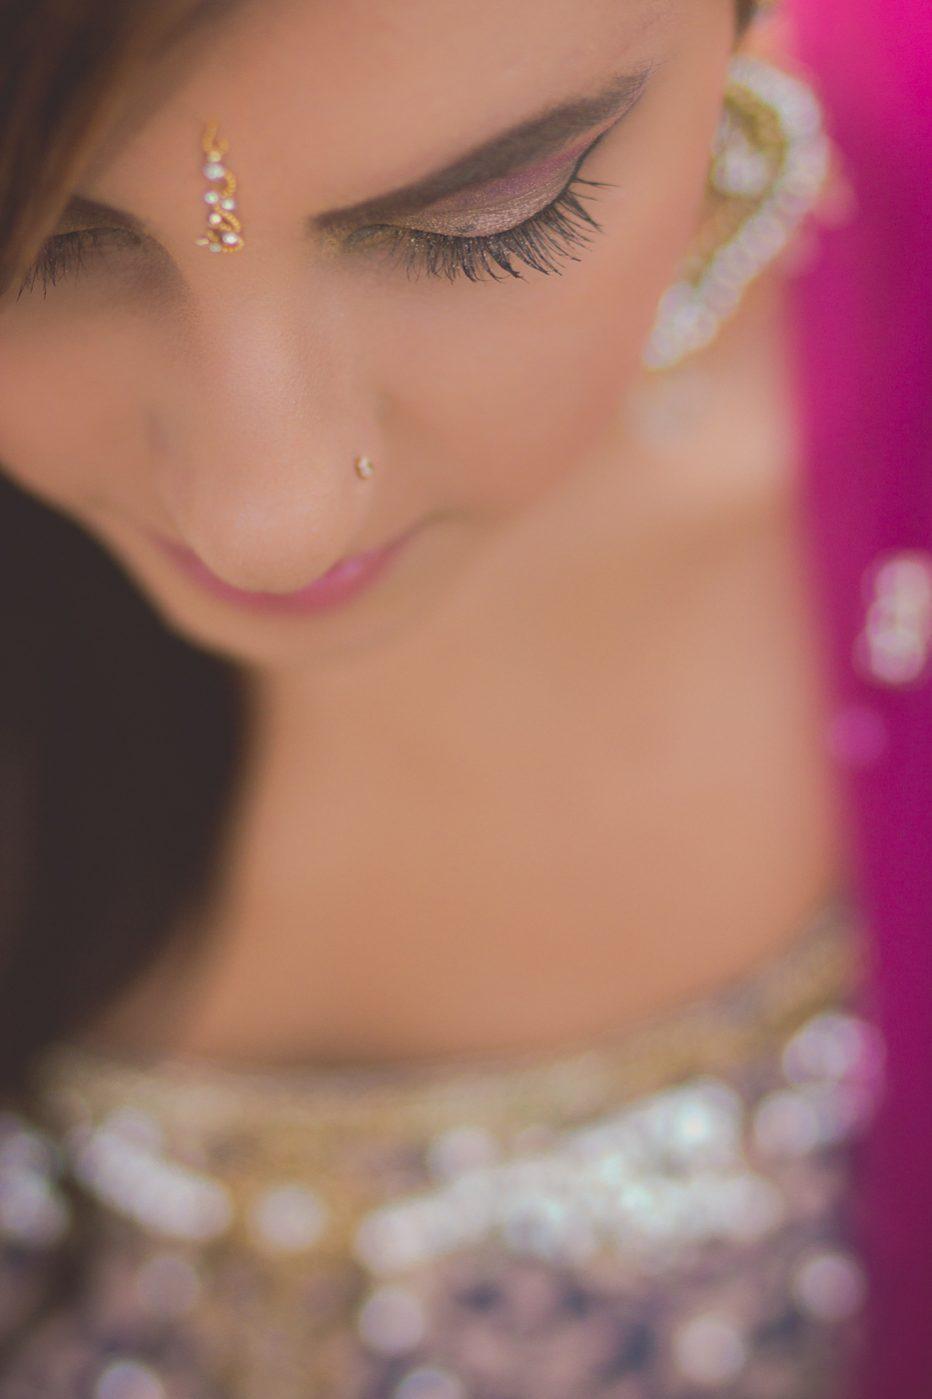 Portrait session focused on girl's eyelashes with lehnga details in bokeh.